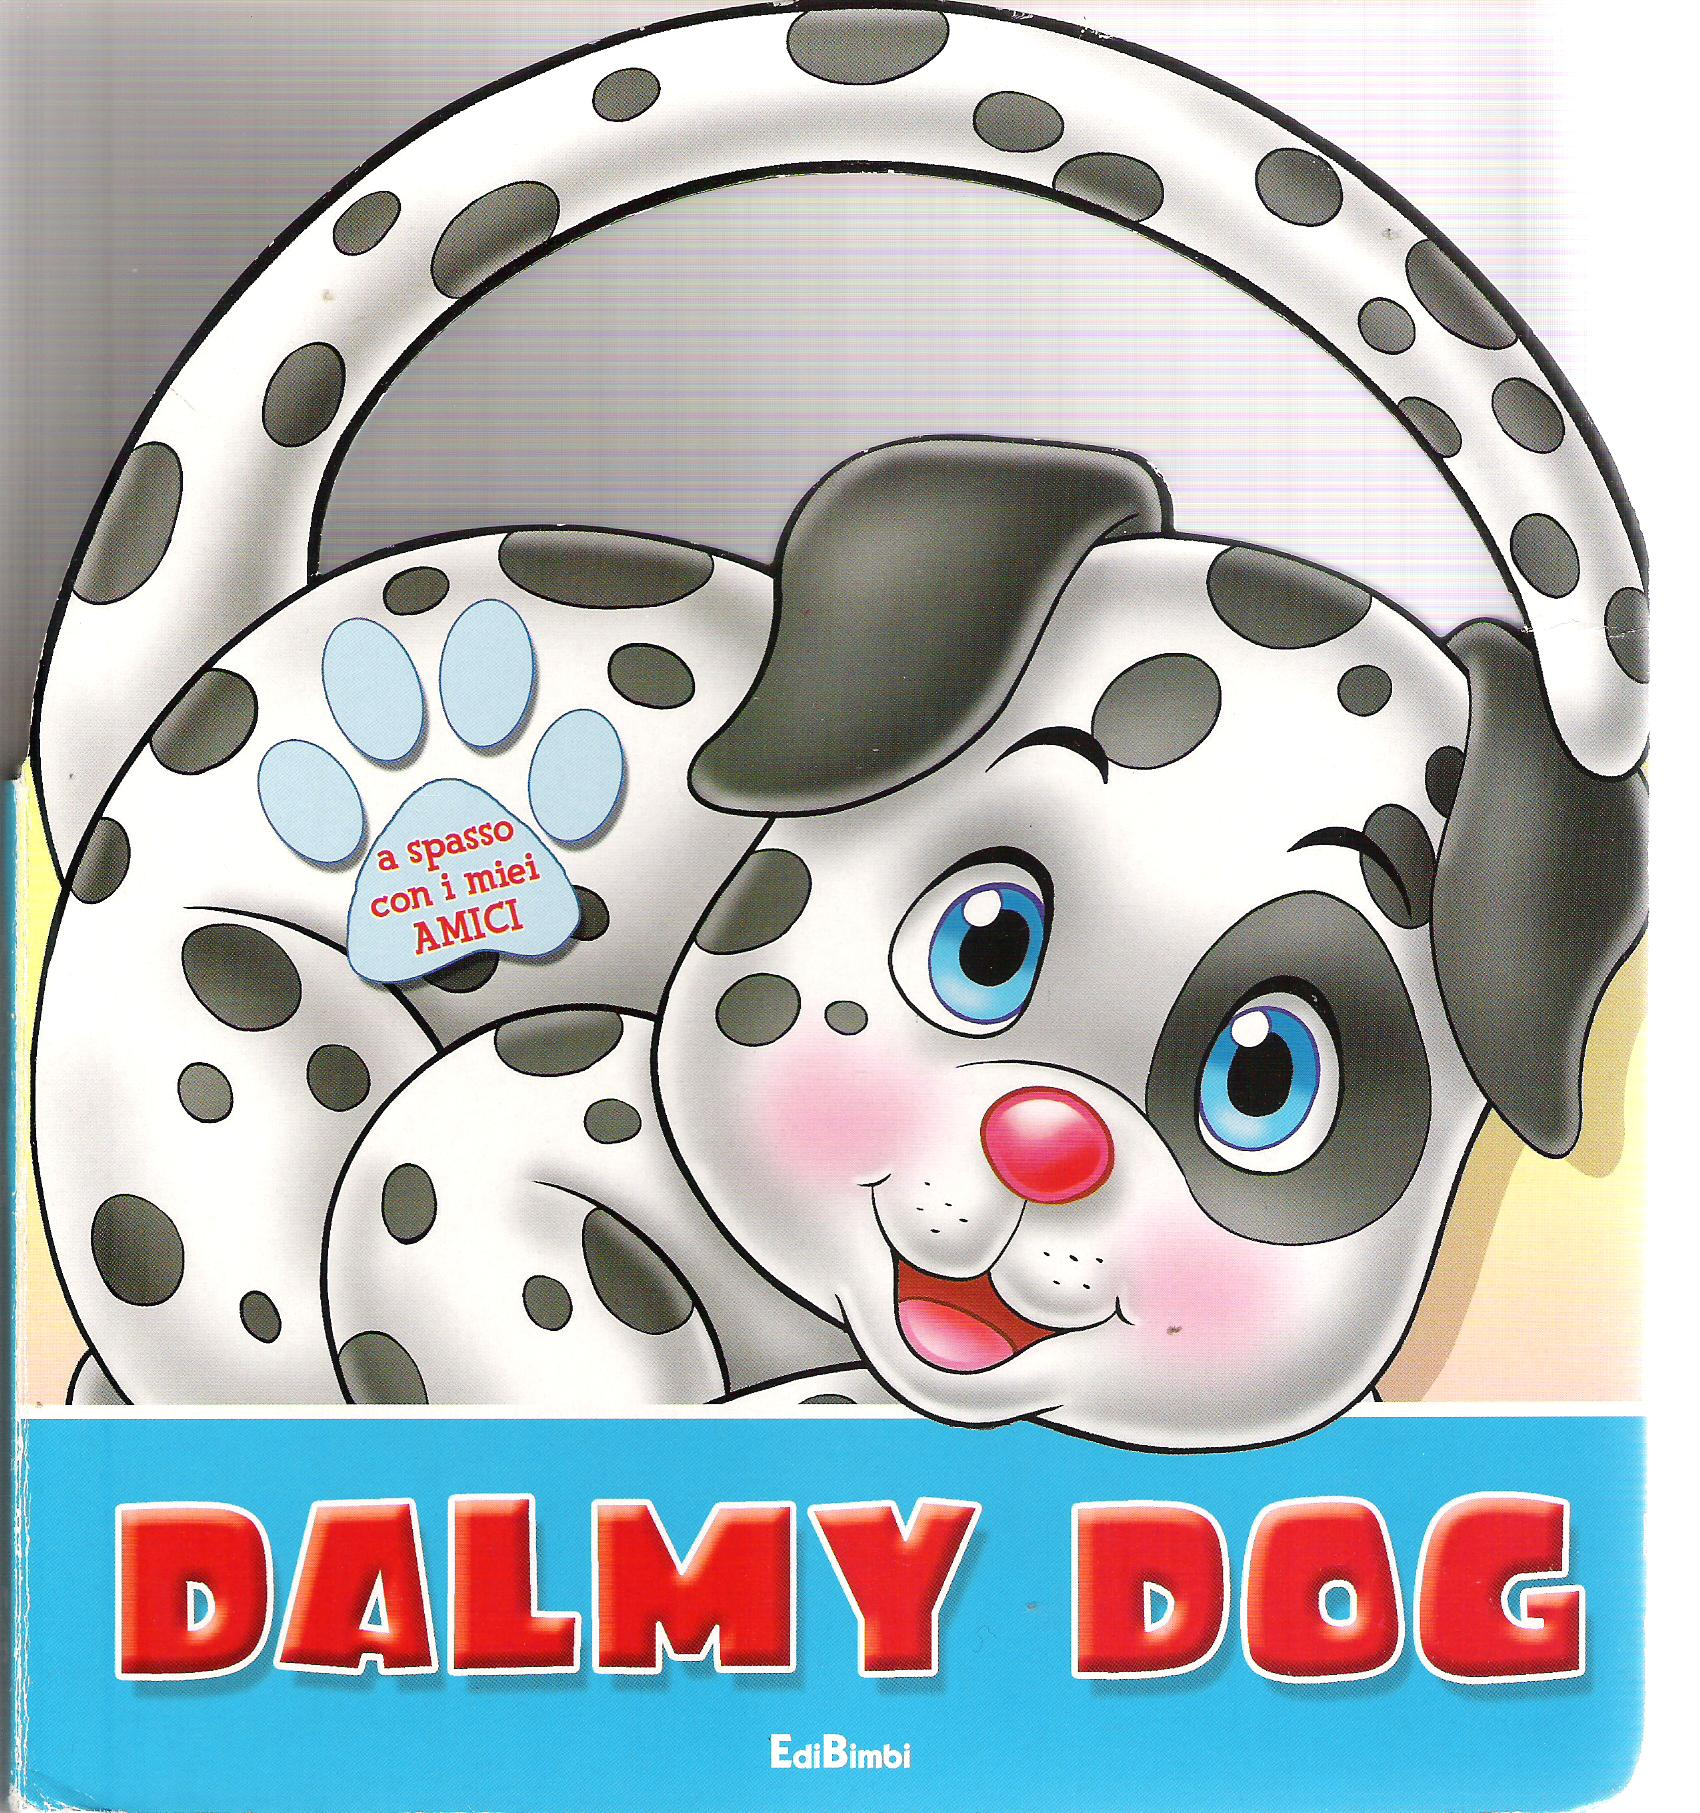 Dalmy Dog